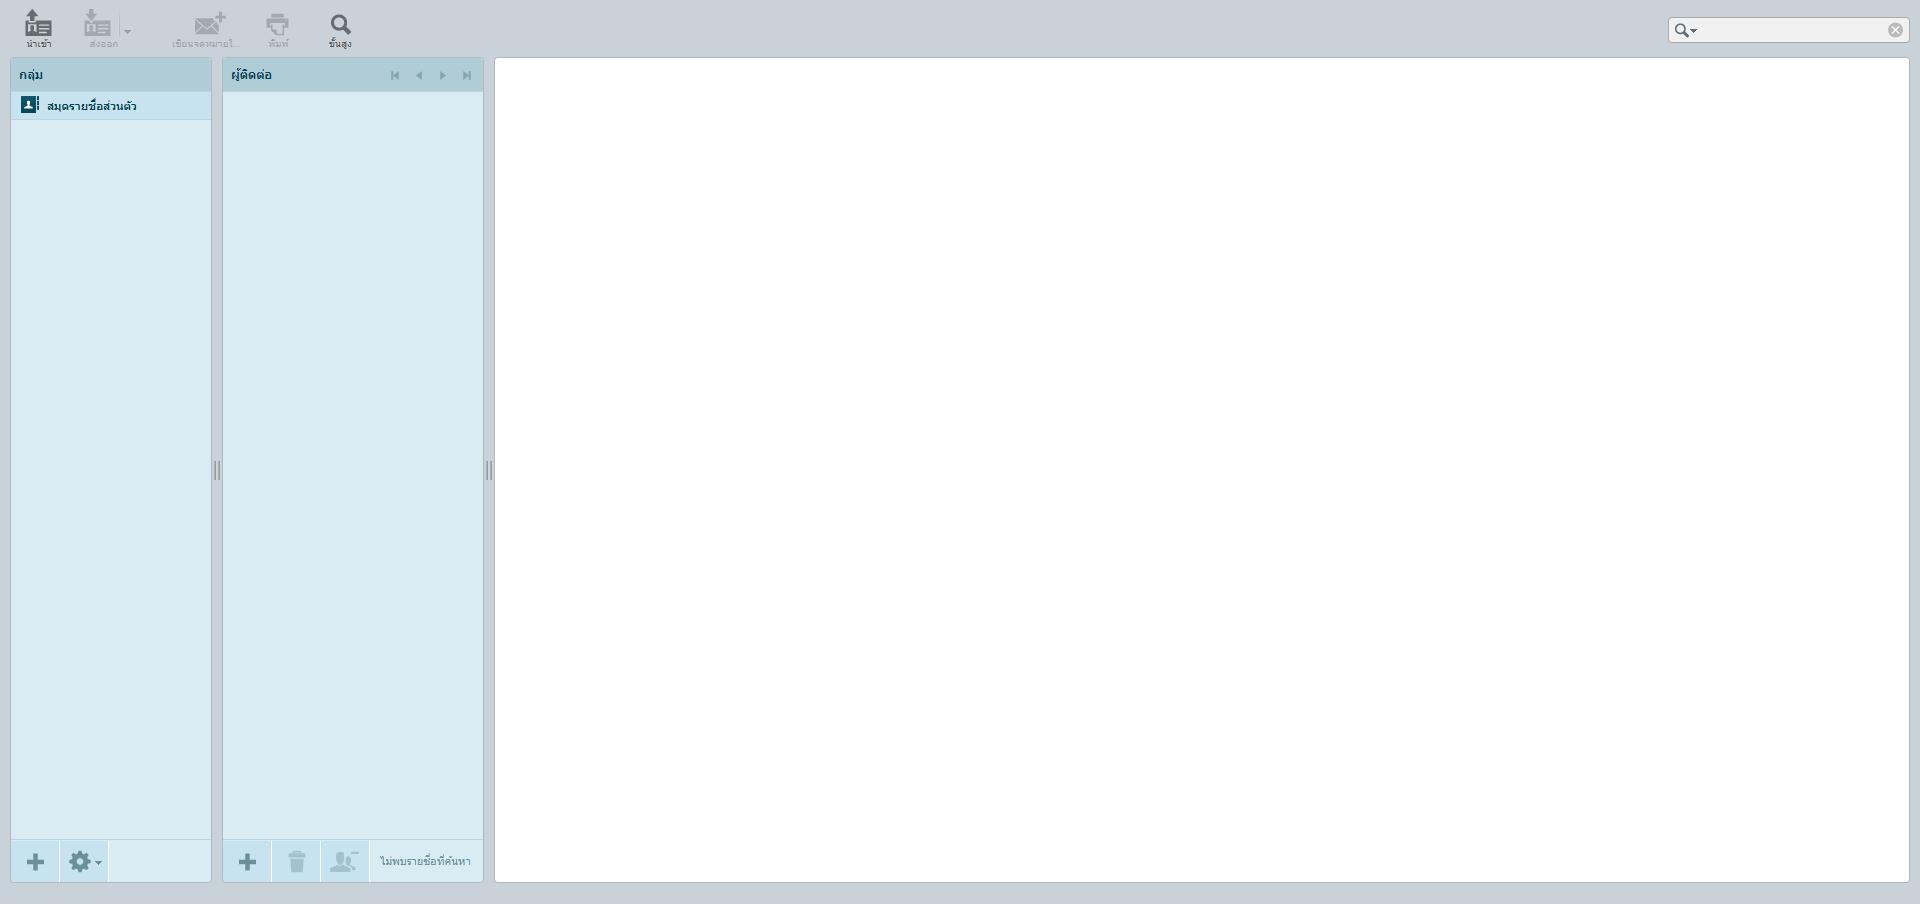 RC Mail (Business Email) Dashboard - สมุดรายชื่อส่วนตัว